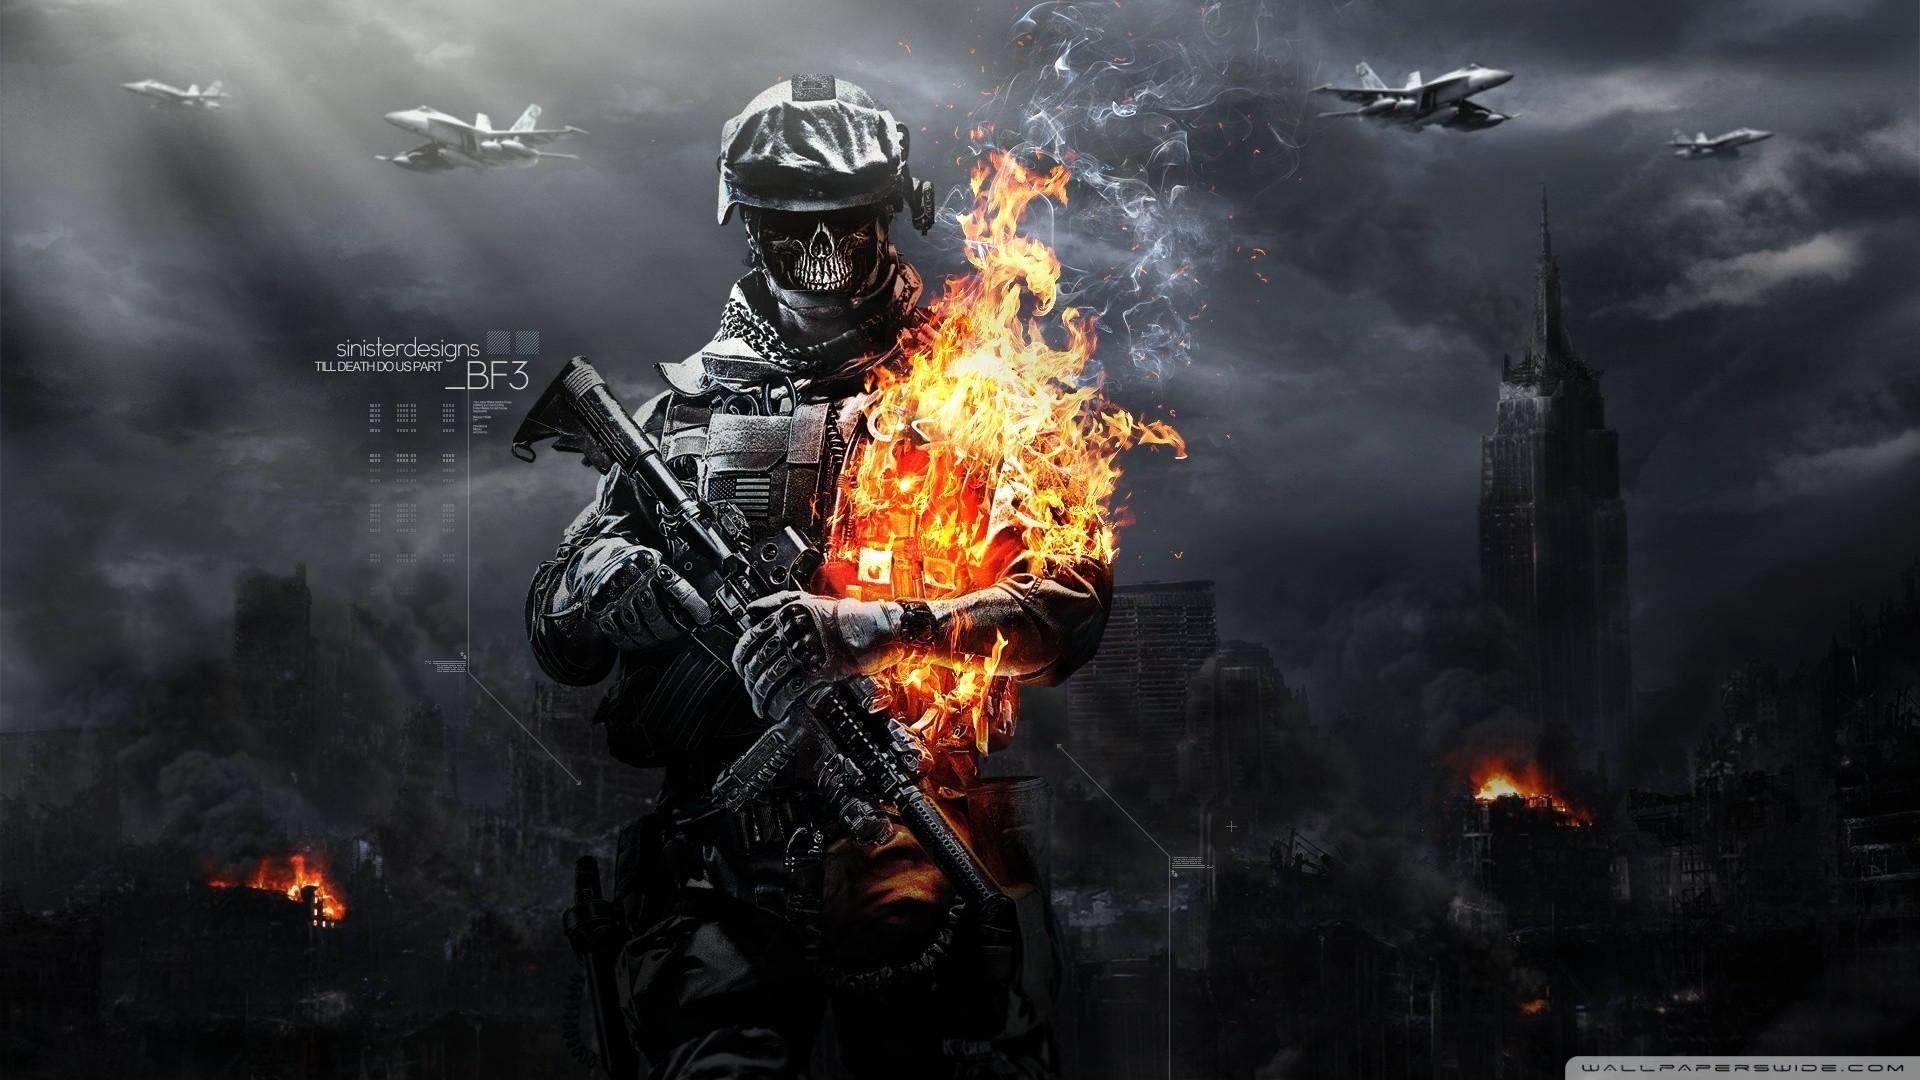 Battlefield 3 Zombies Wallpaper Battlefield, 3, Zombies